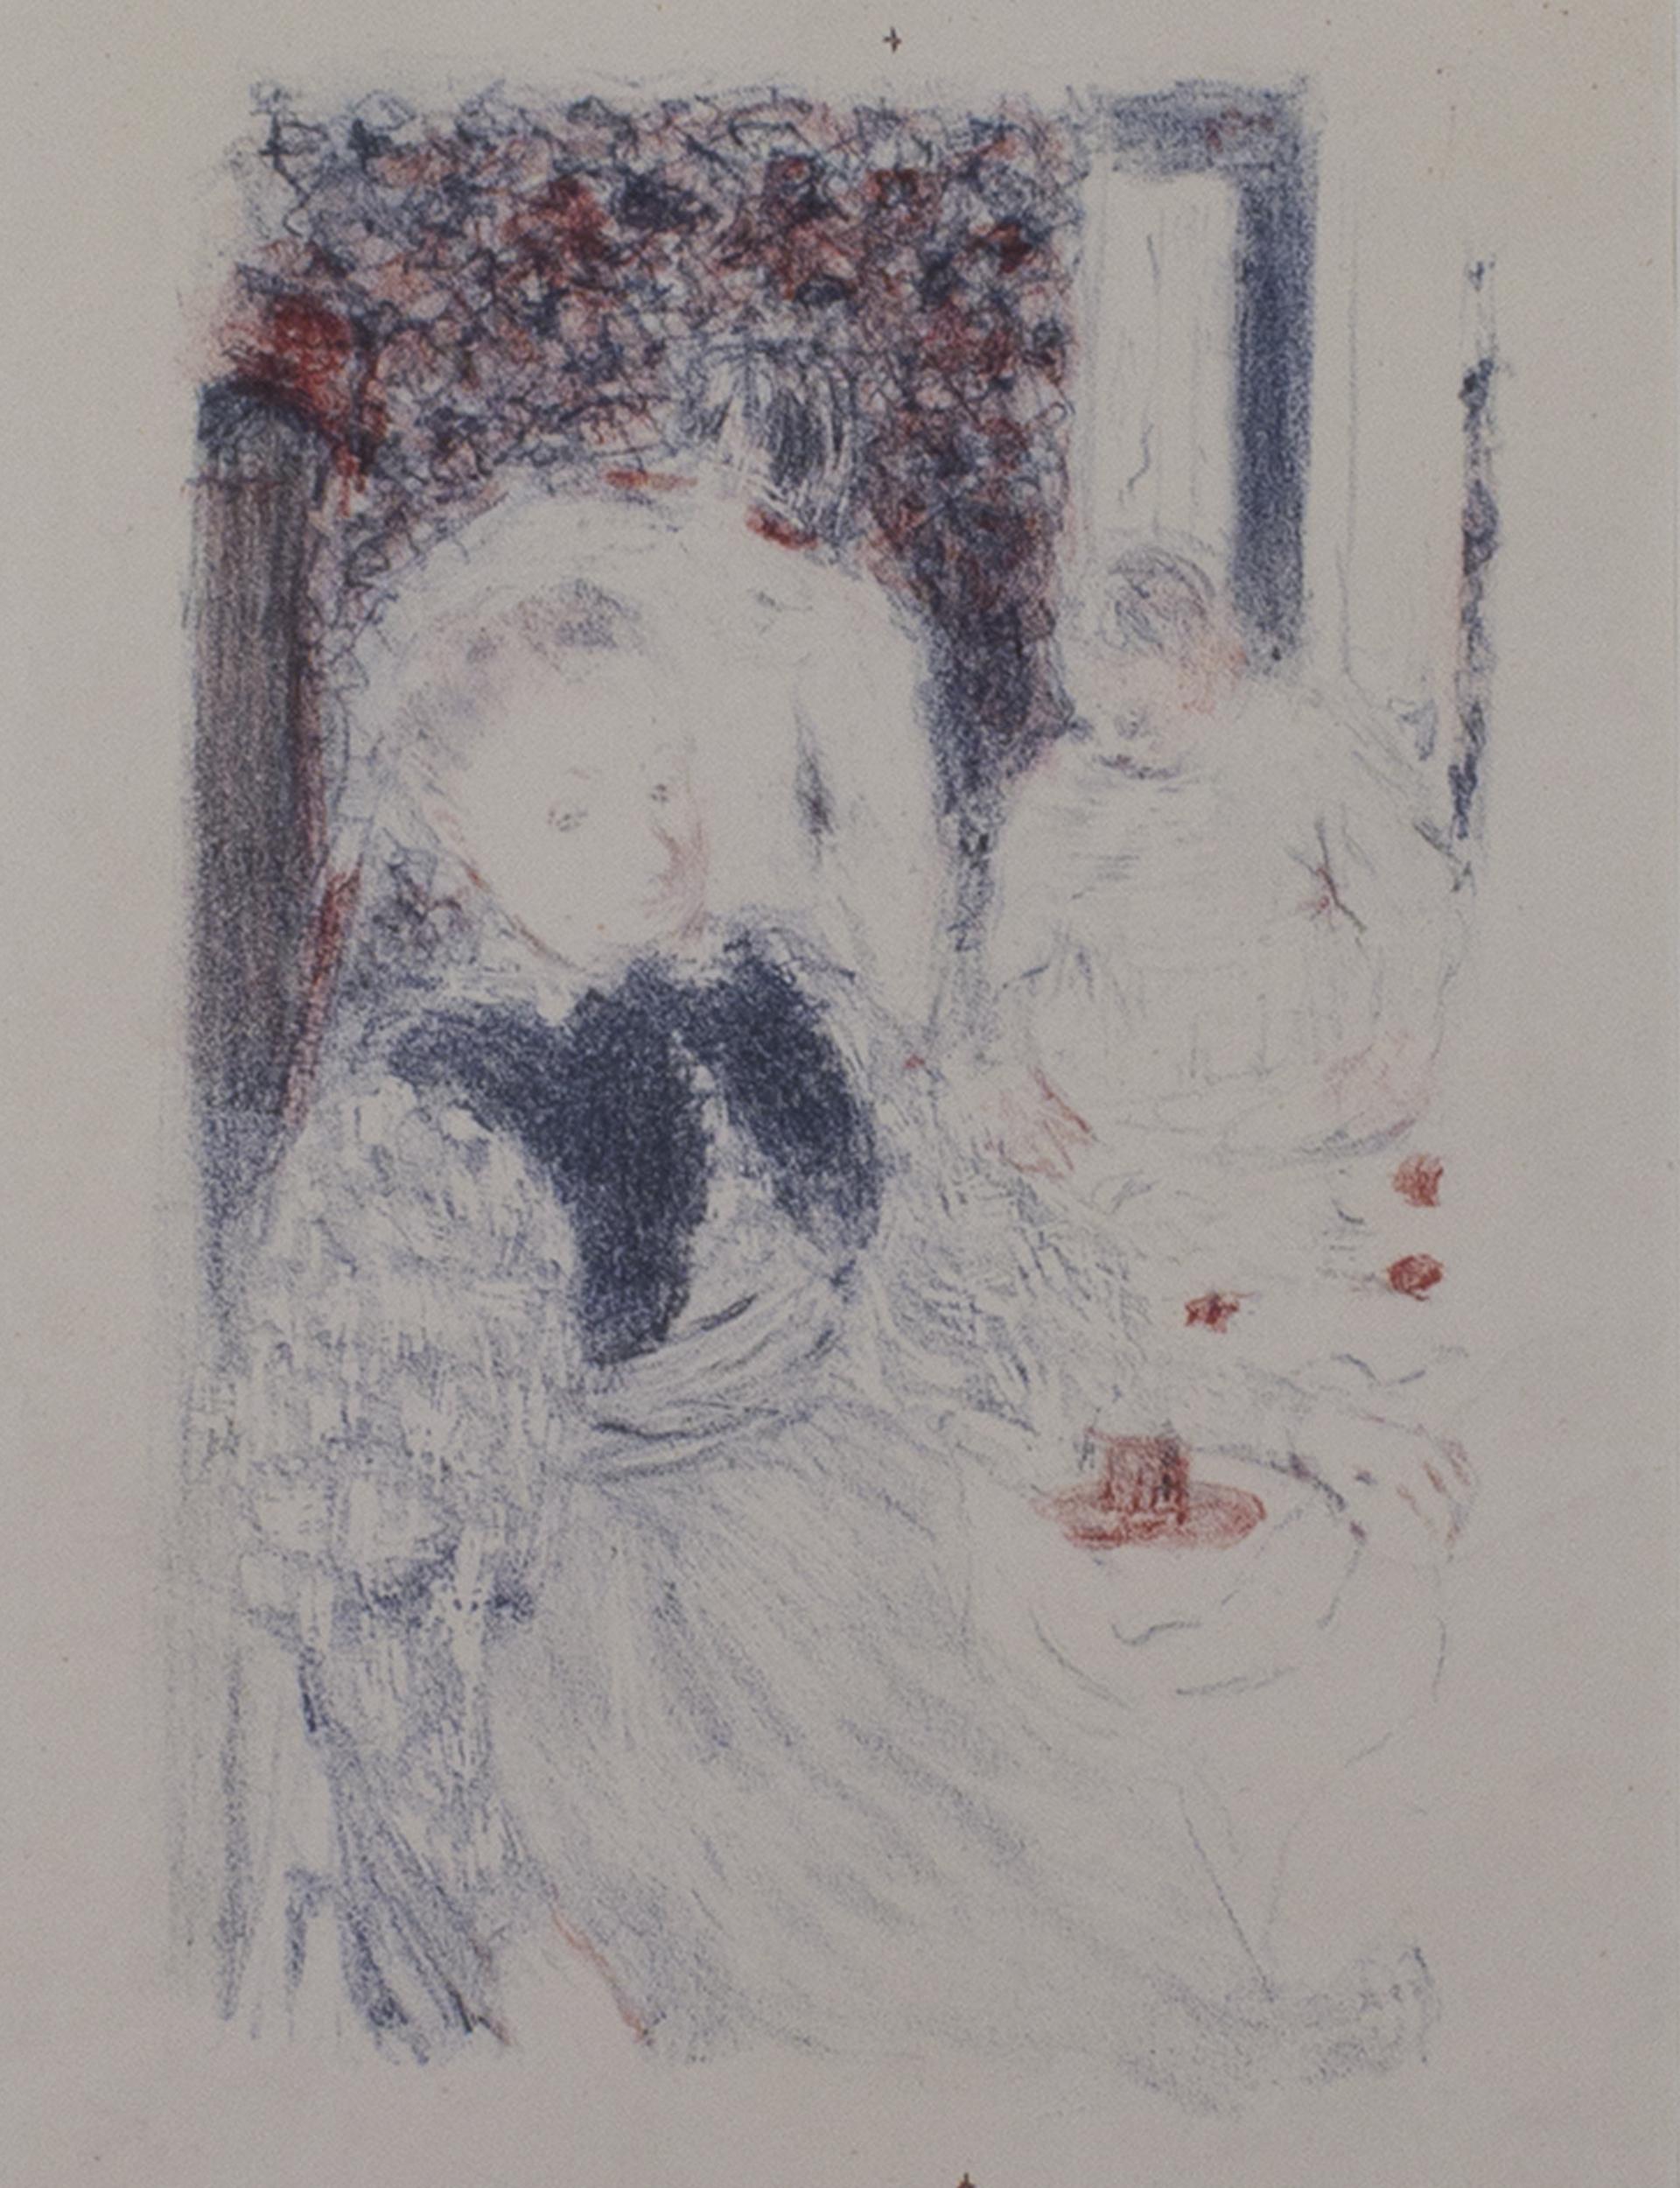 Le Dejeuner Ref. RM #15 Ed: of 20 by Edouard Vuillard